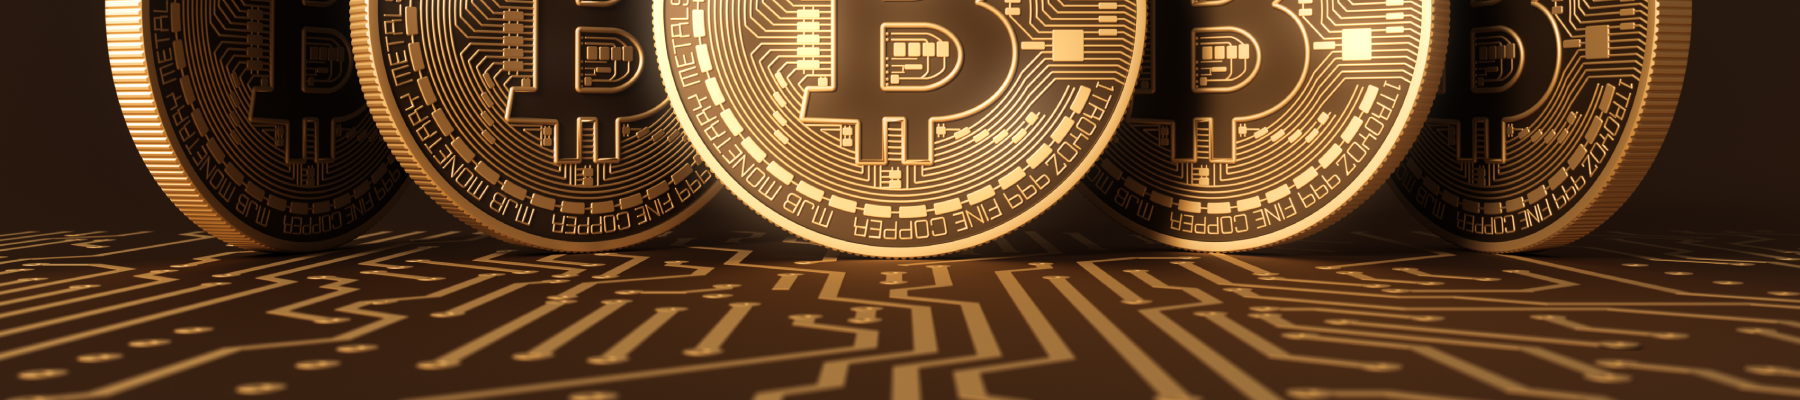 bitcoin terminologies banner